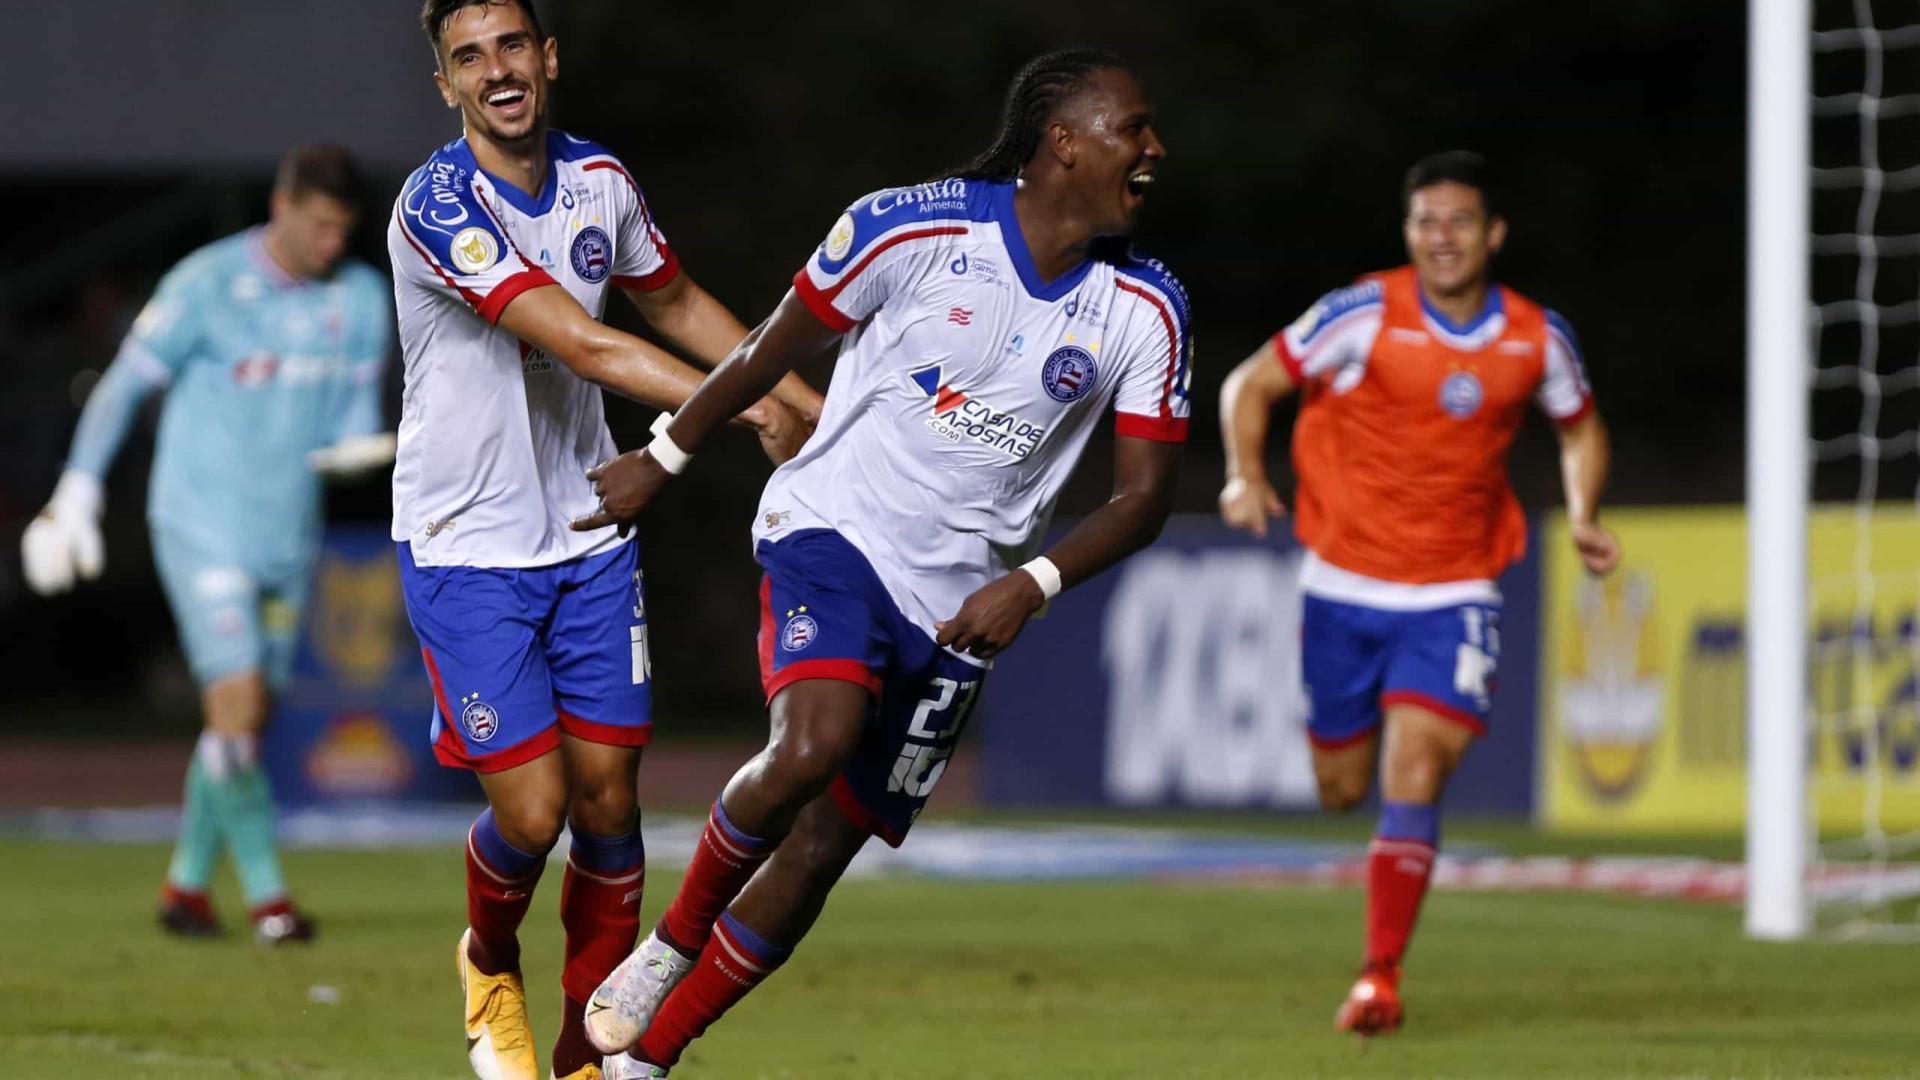 Rodallega marca 4 gols, Bahia derrota Fortaleza em casa e afasta crise